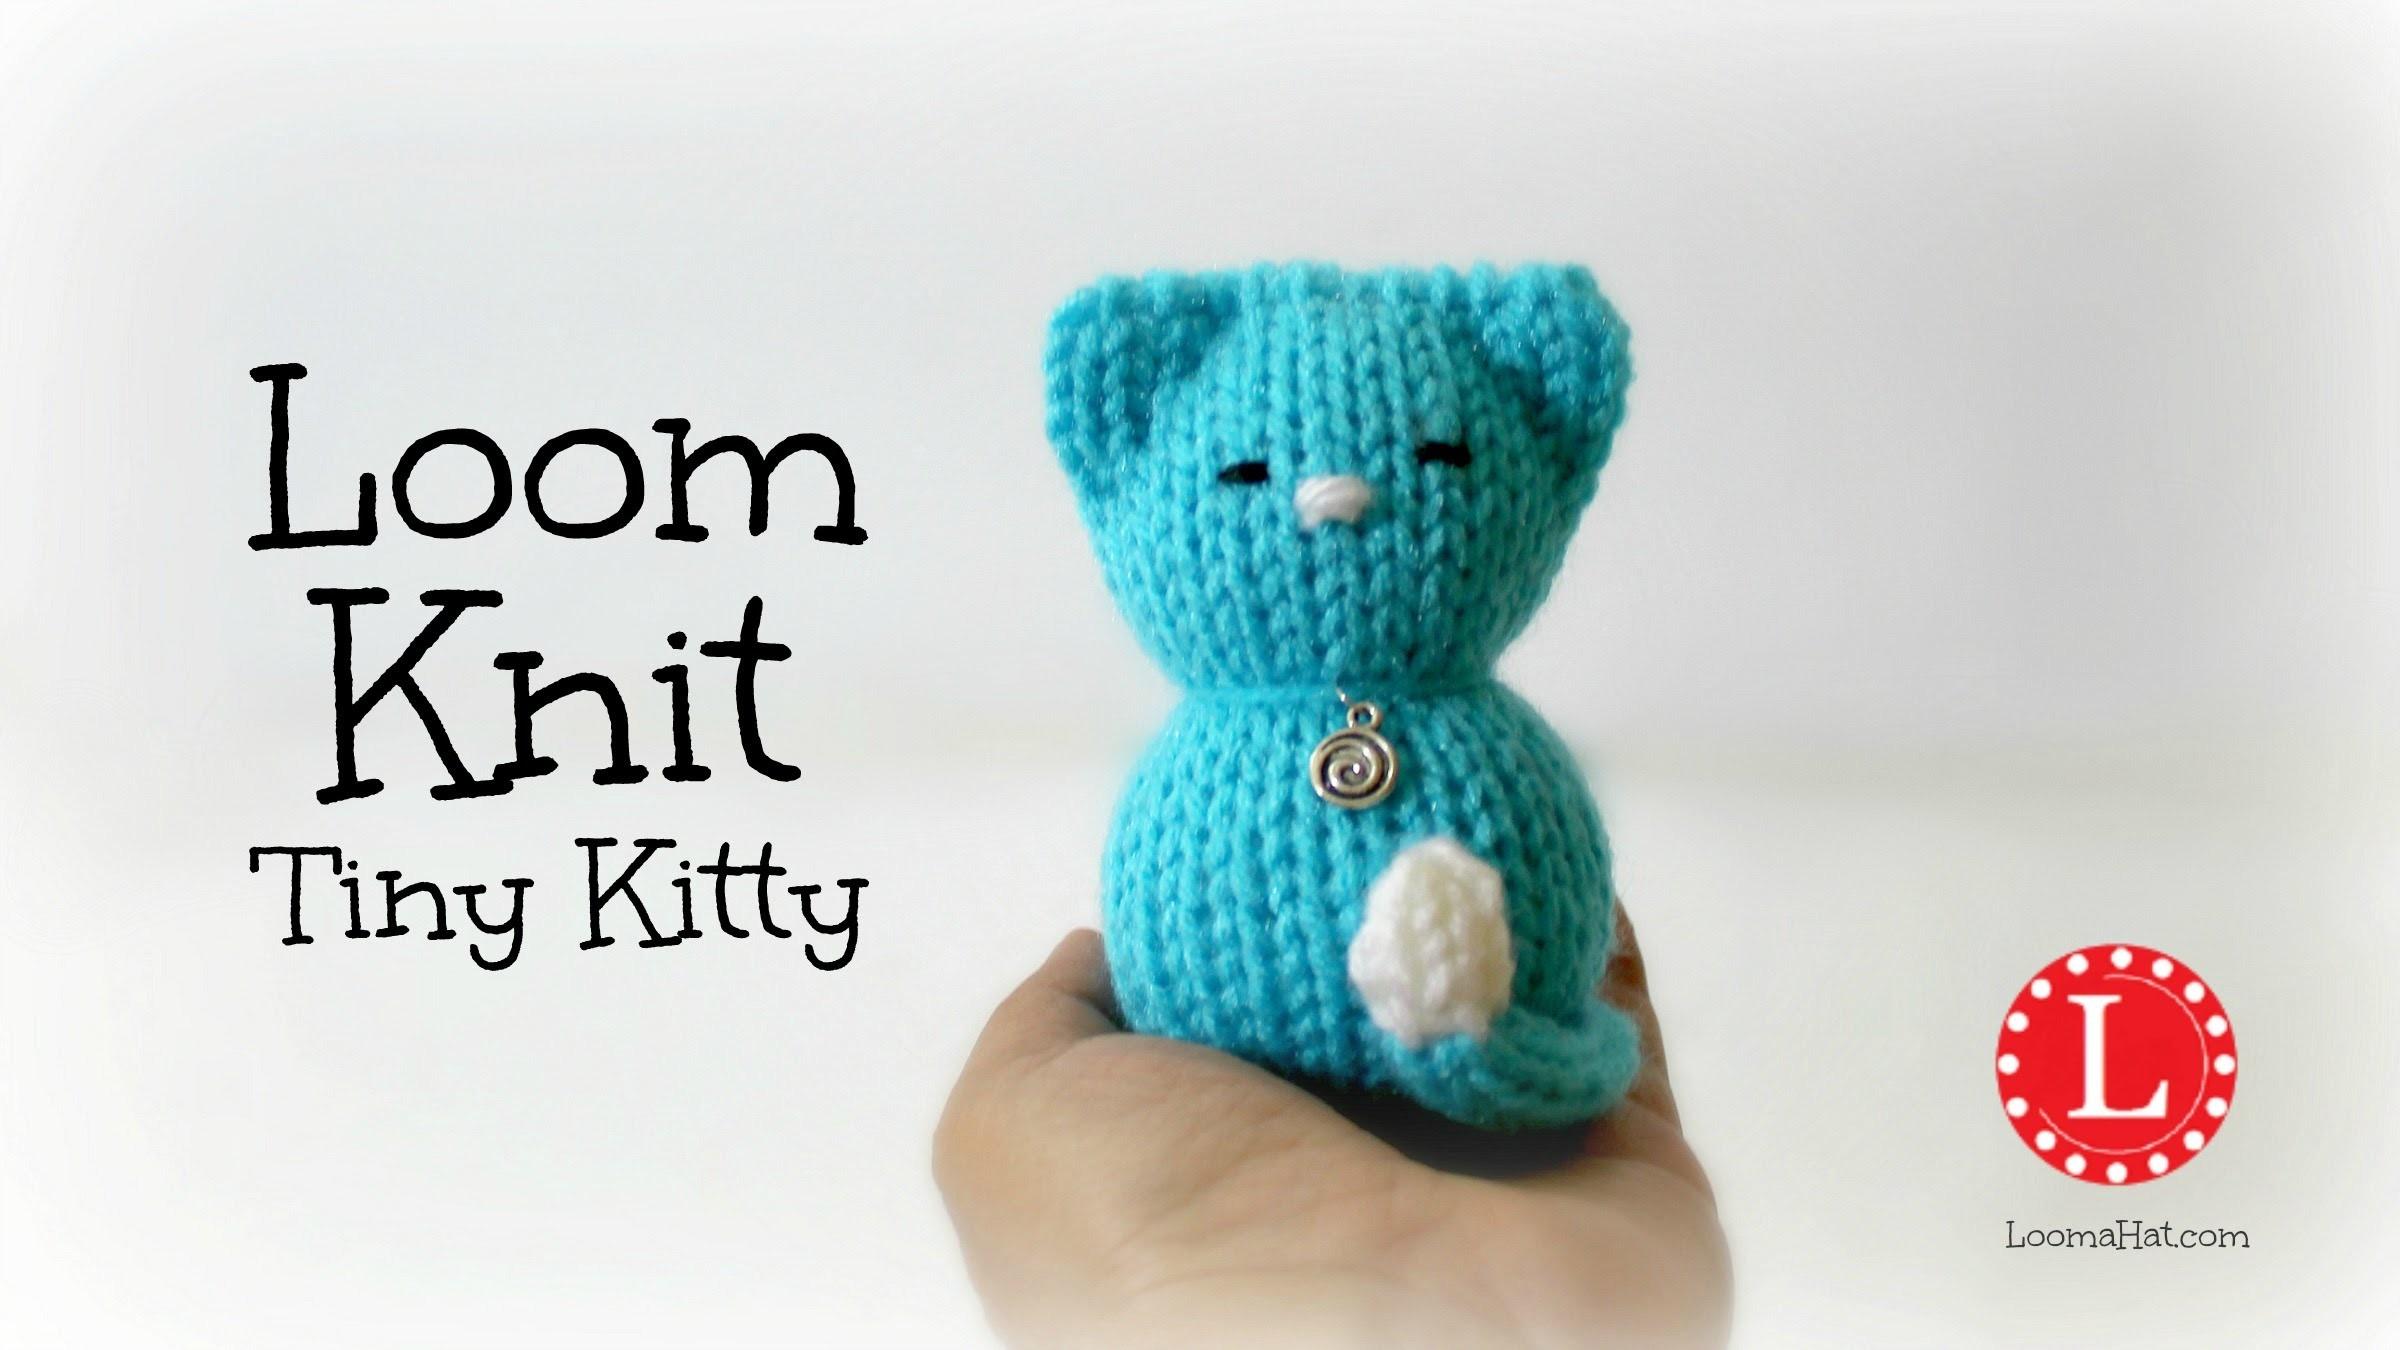 Knitting Instructions M1 : Knitting loom board adjustable solid hardwood